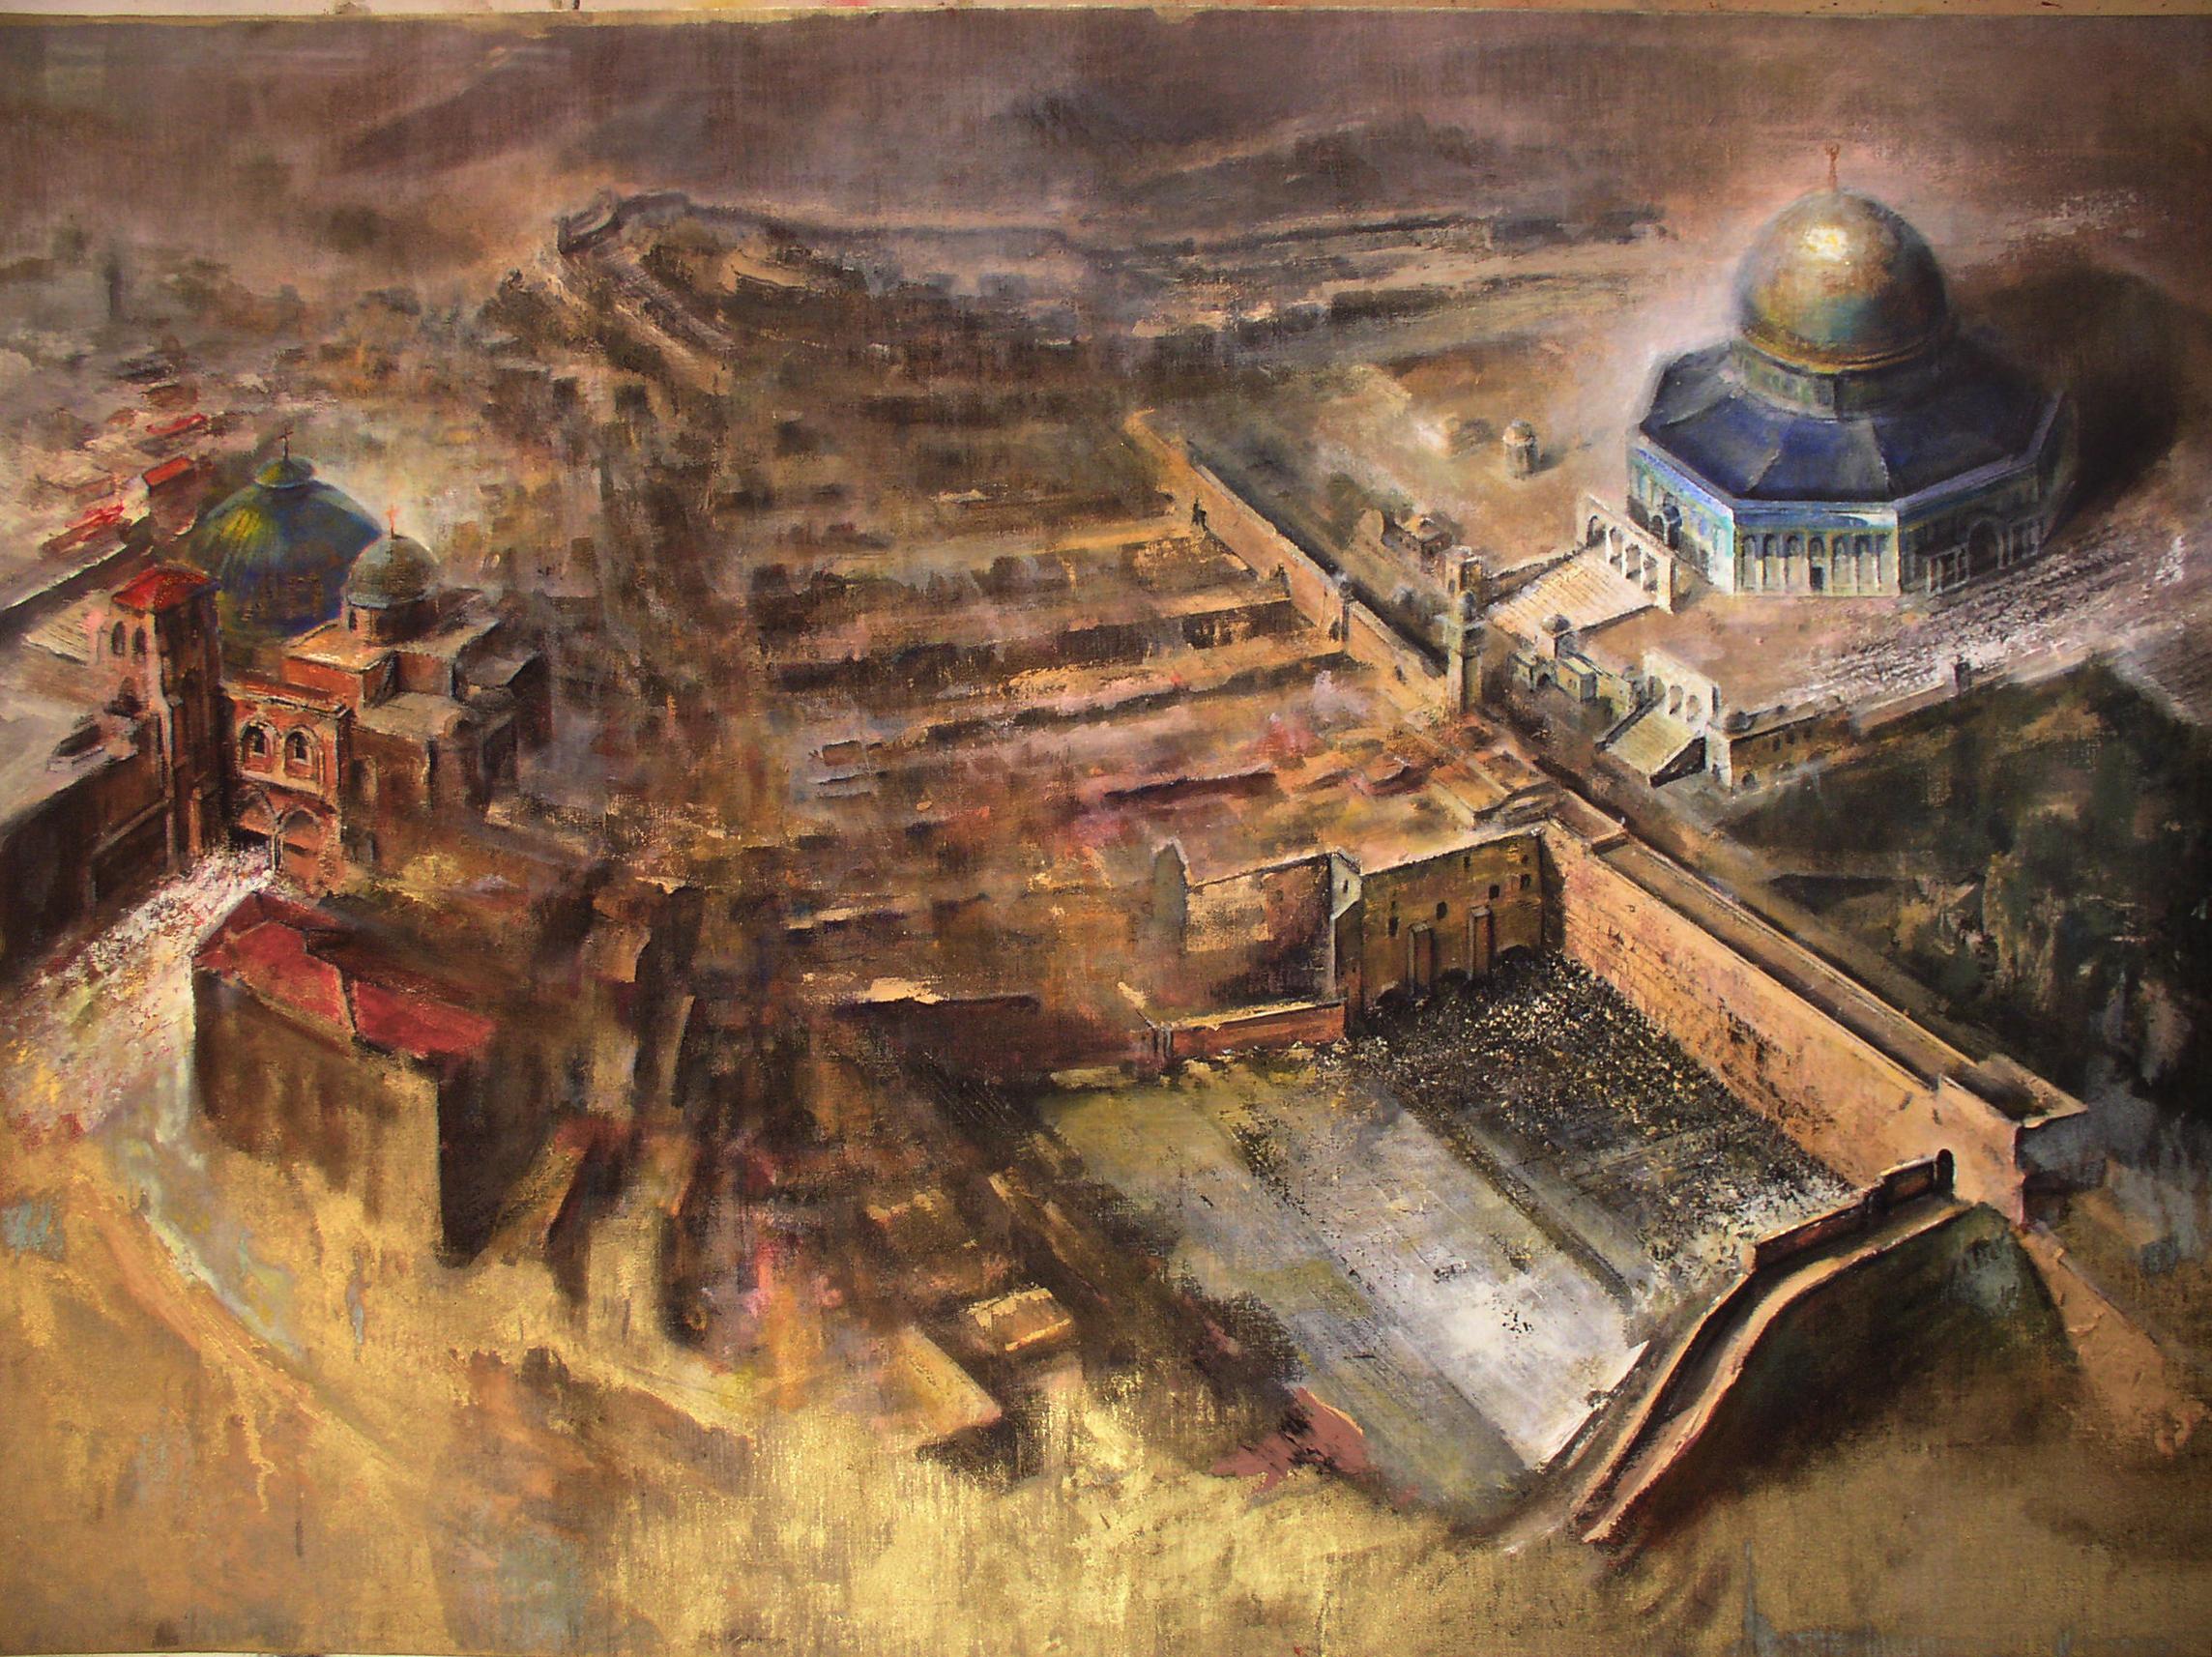 Gerusalemme-le tre religioni monoteiste -santosuosso 2003- 100x140